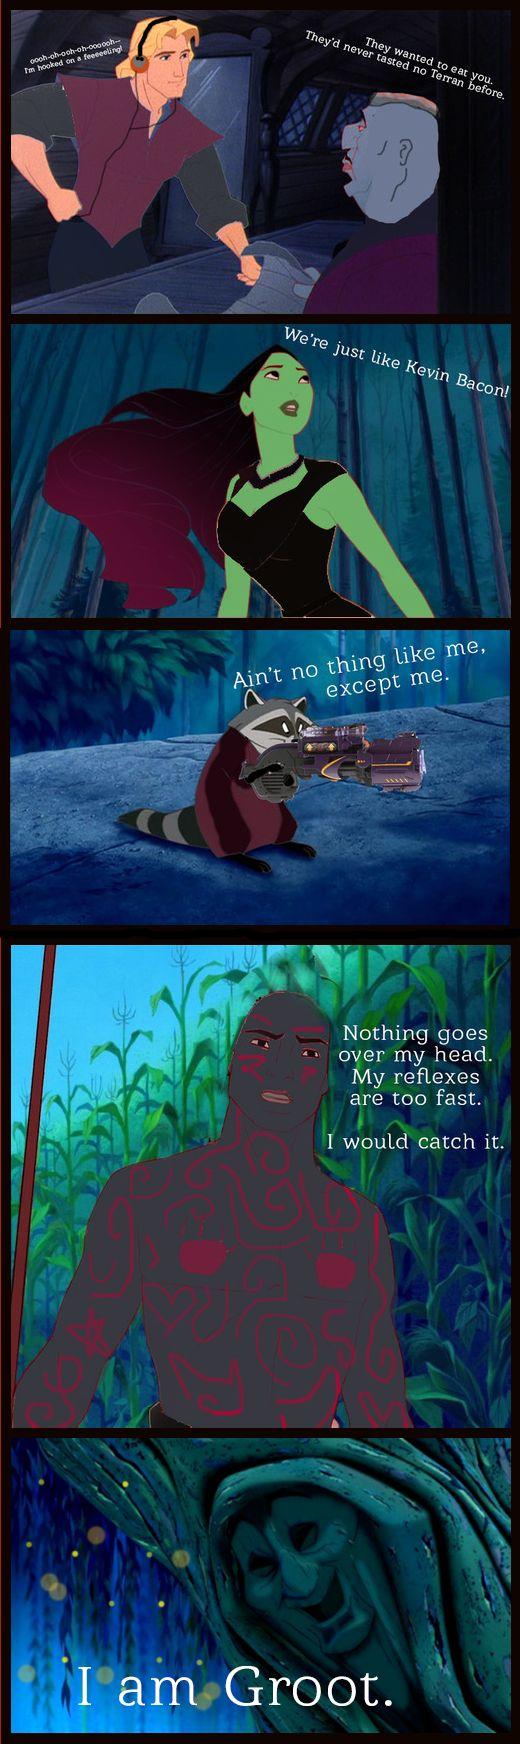 Pocahontas/Guardians of the Galaxy crossover- AHHHHHHHHHHHHH